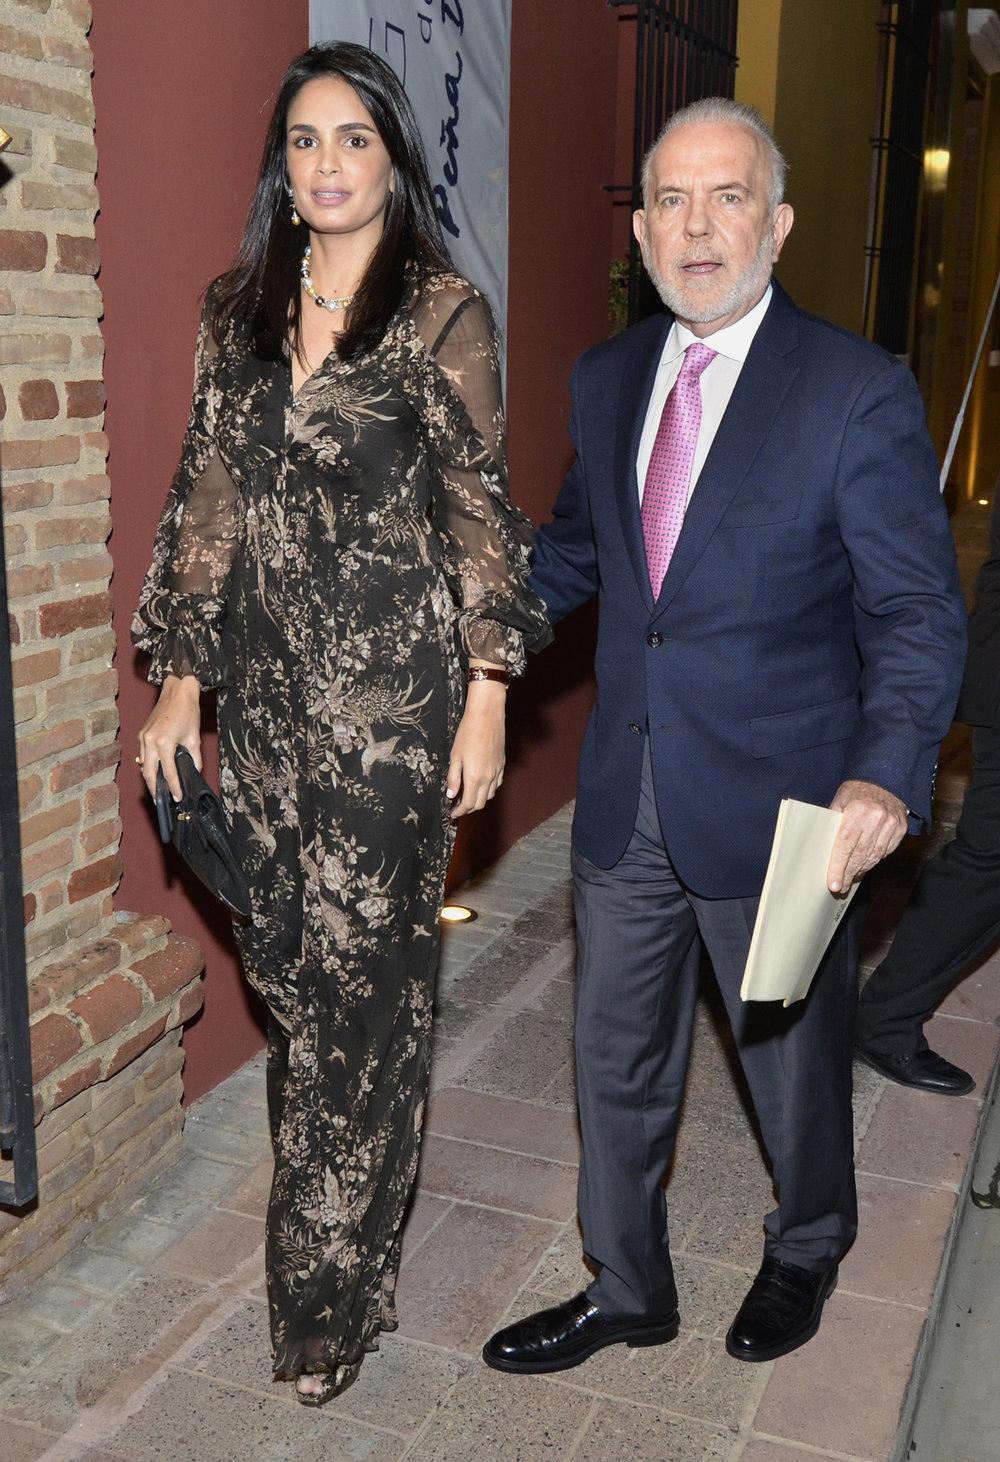 Foto 13 Judith Cury y George Manuel Hazoury Peña.JPG